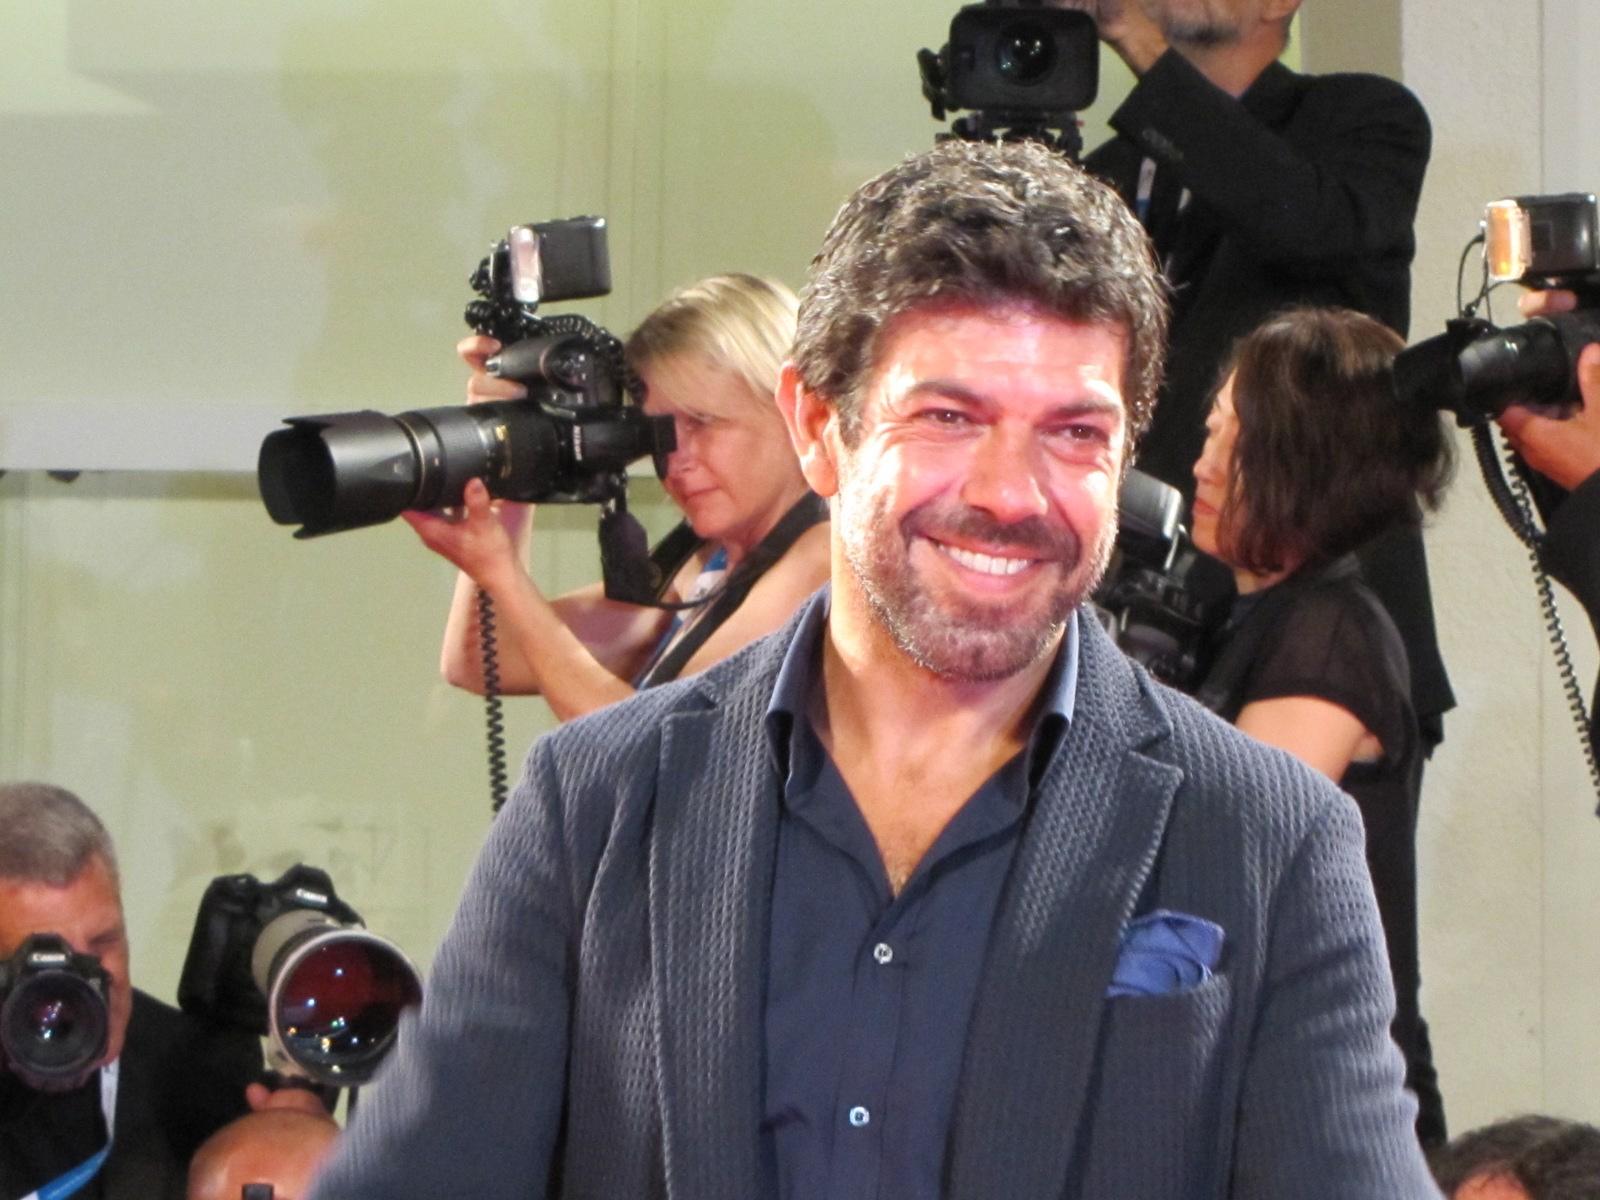 Senza nessuna pietà a Venezia 2014 - Pierfrancesco Favino sul red carpet